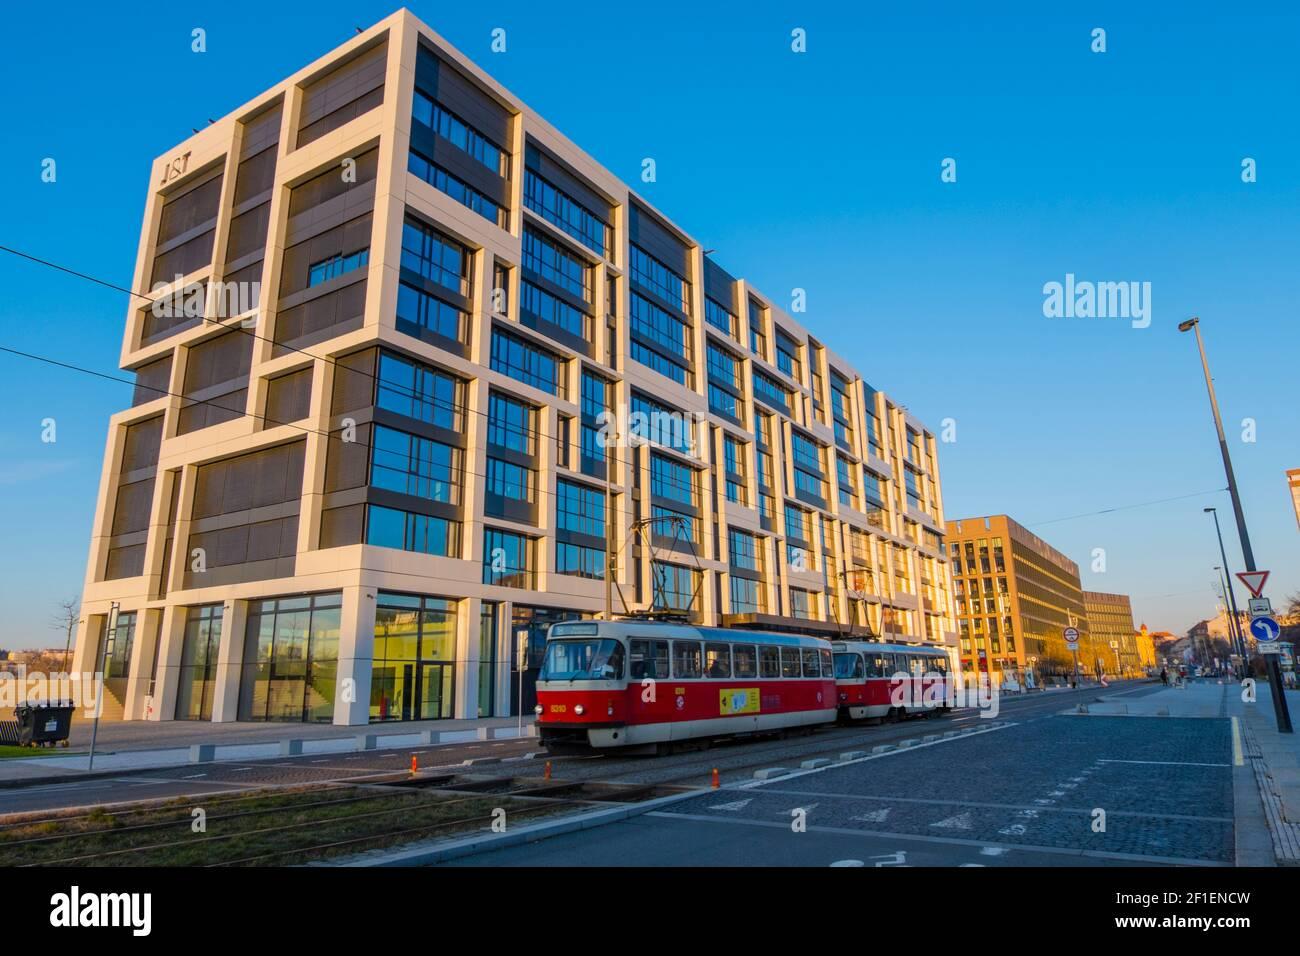 J&T Banka, edificio de oficinas, Sokolovska, Karlin, Praga, República Checa Foto de stock